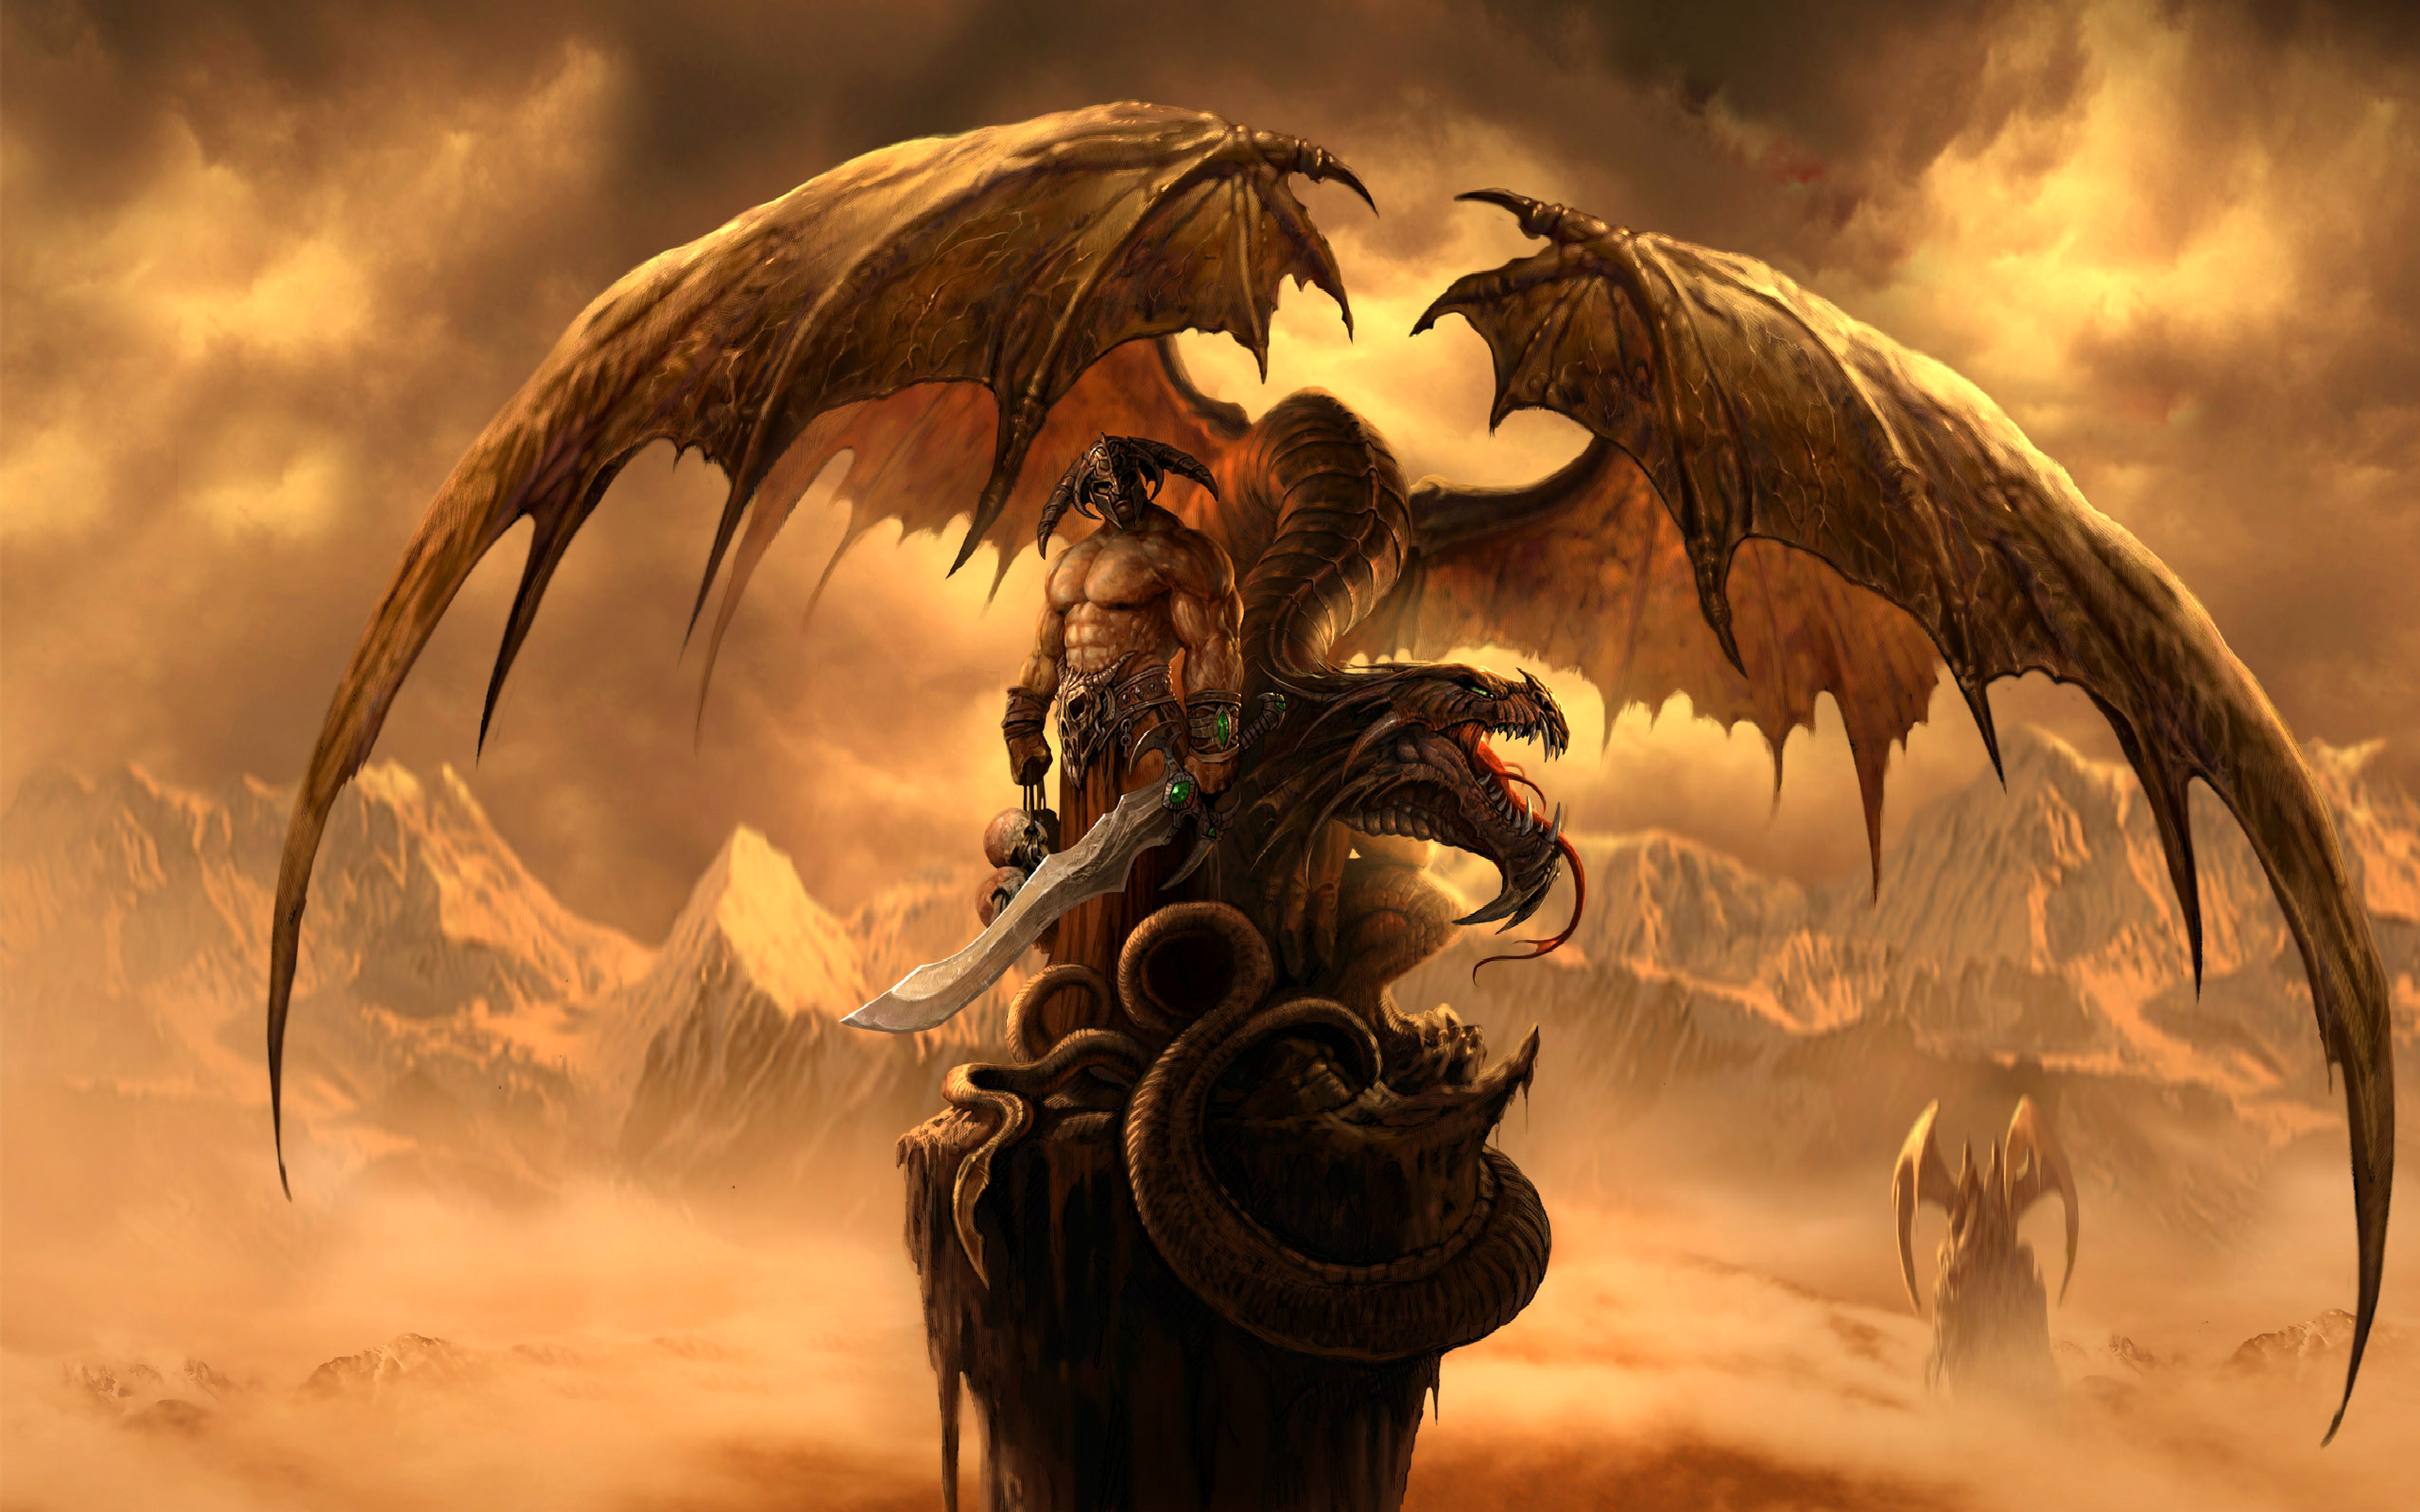 Fantasy - Drake  Warrior Fantasy Sword Bakgrund